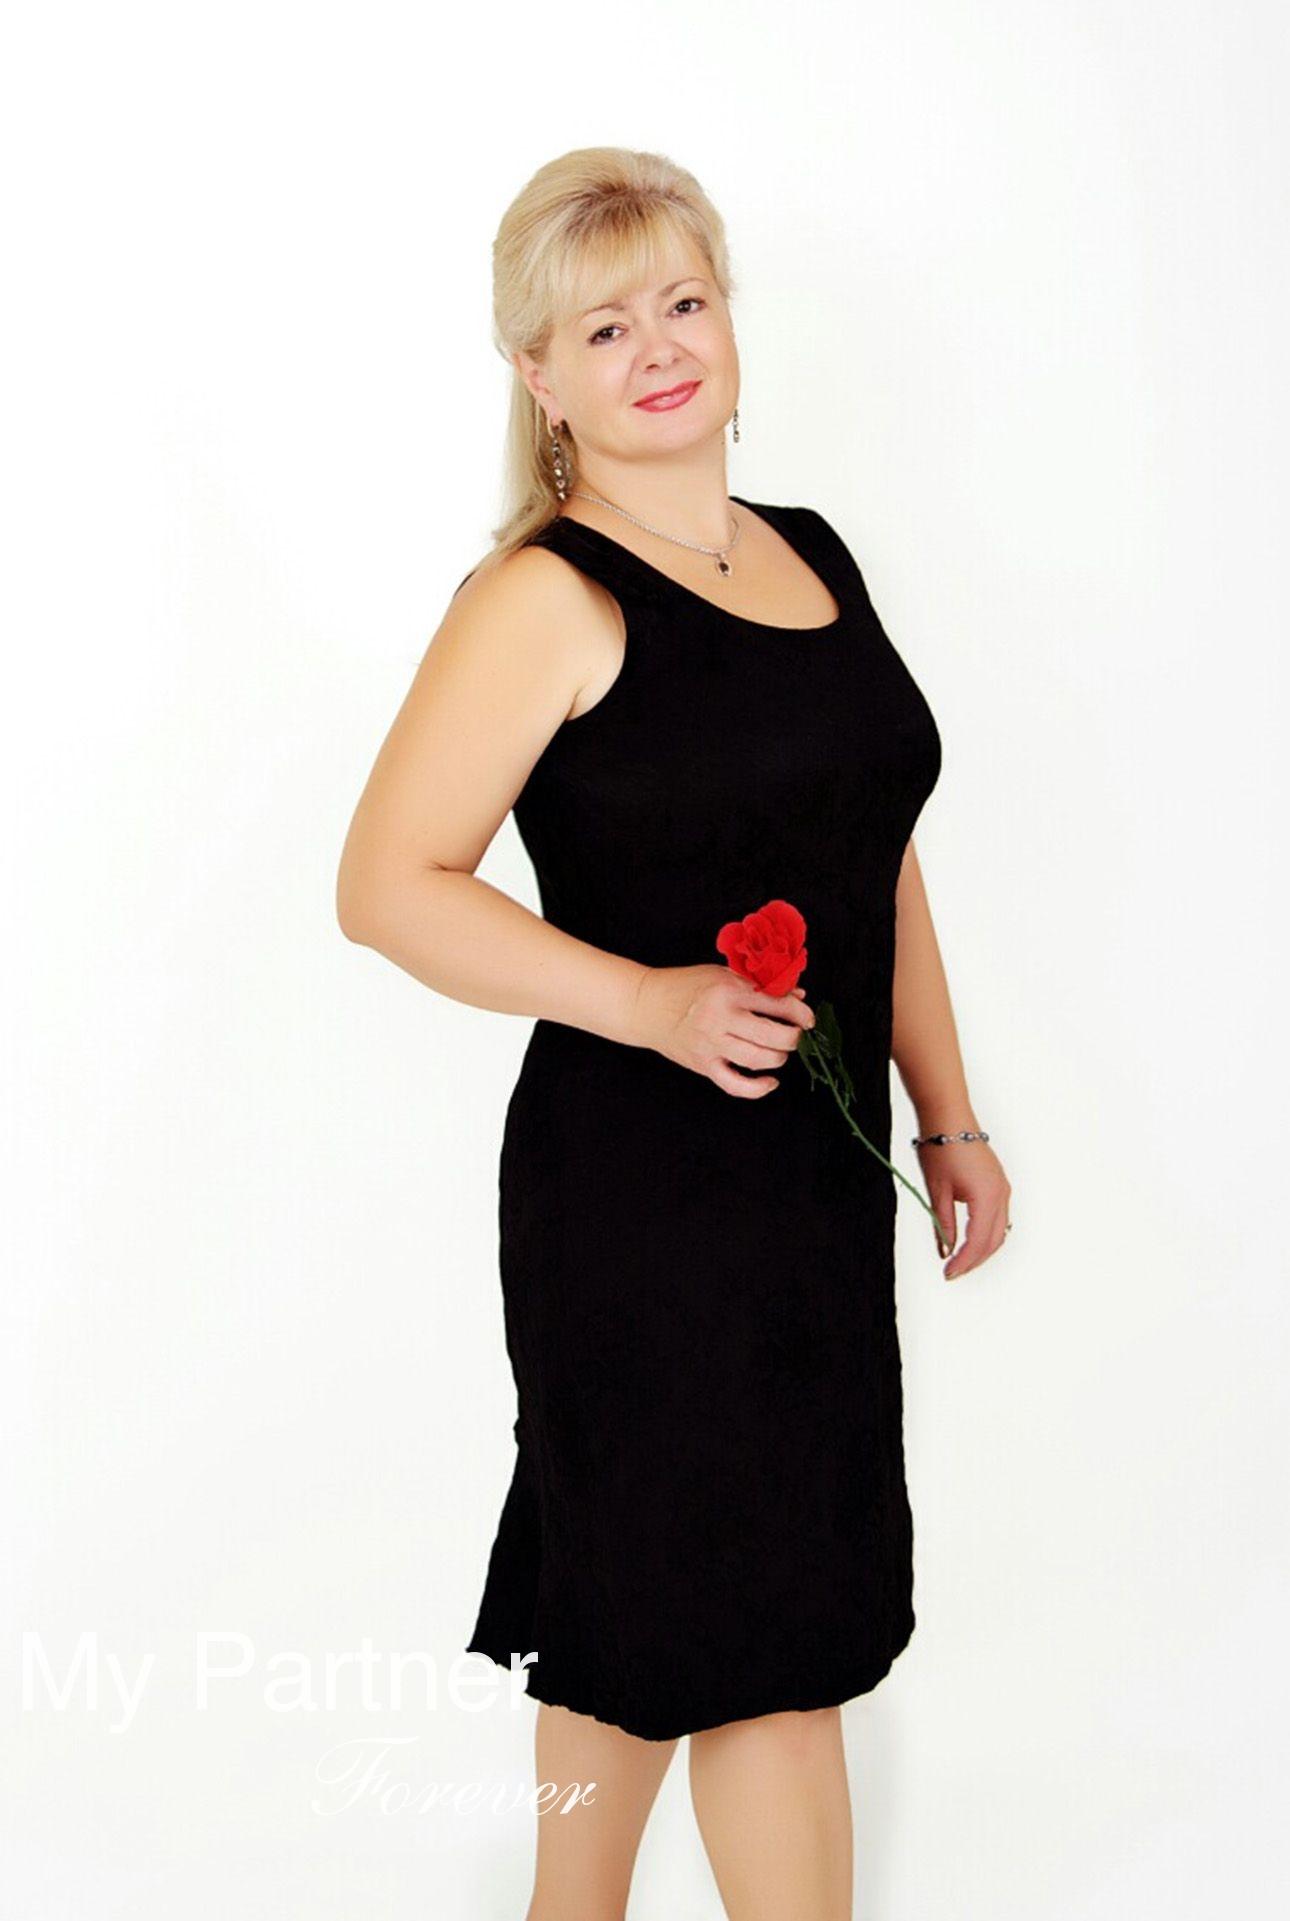 Women 895 Ukrain